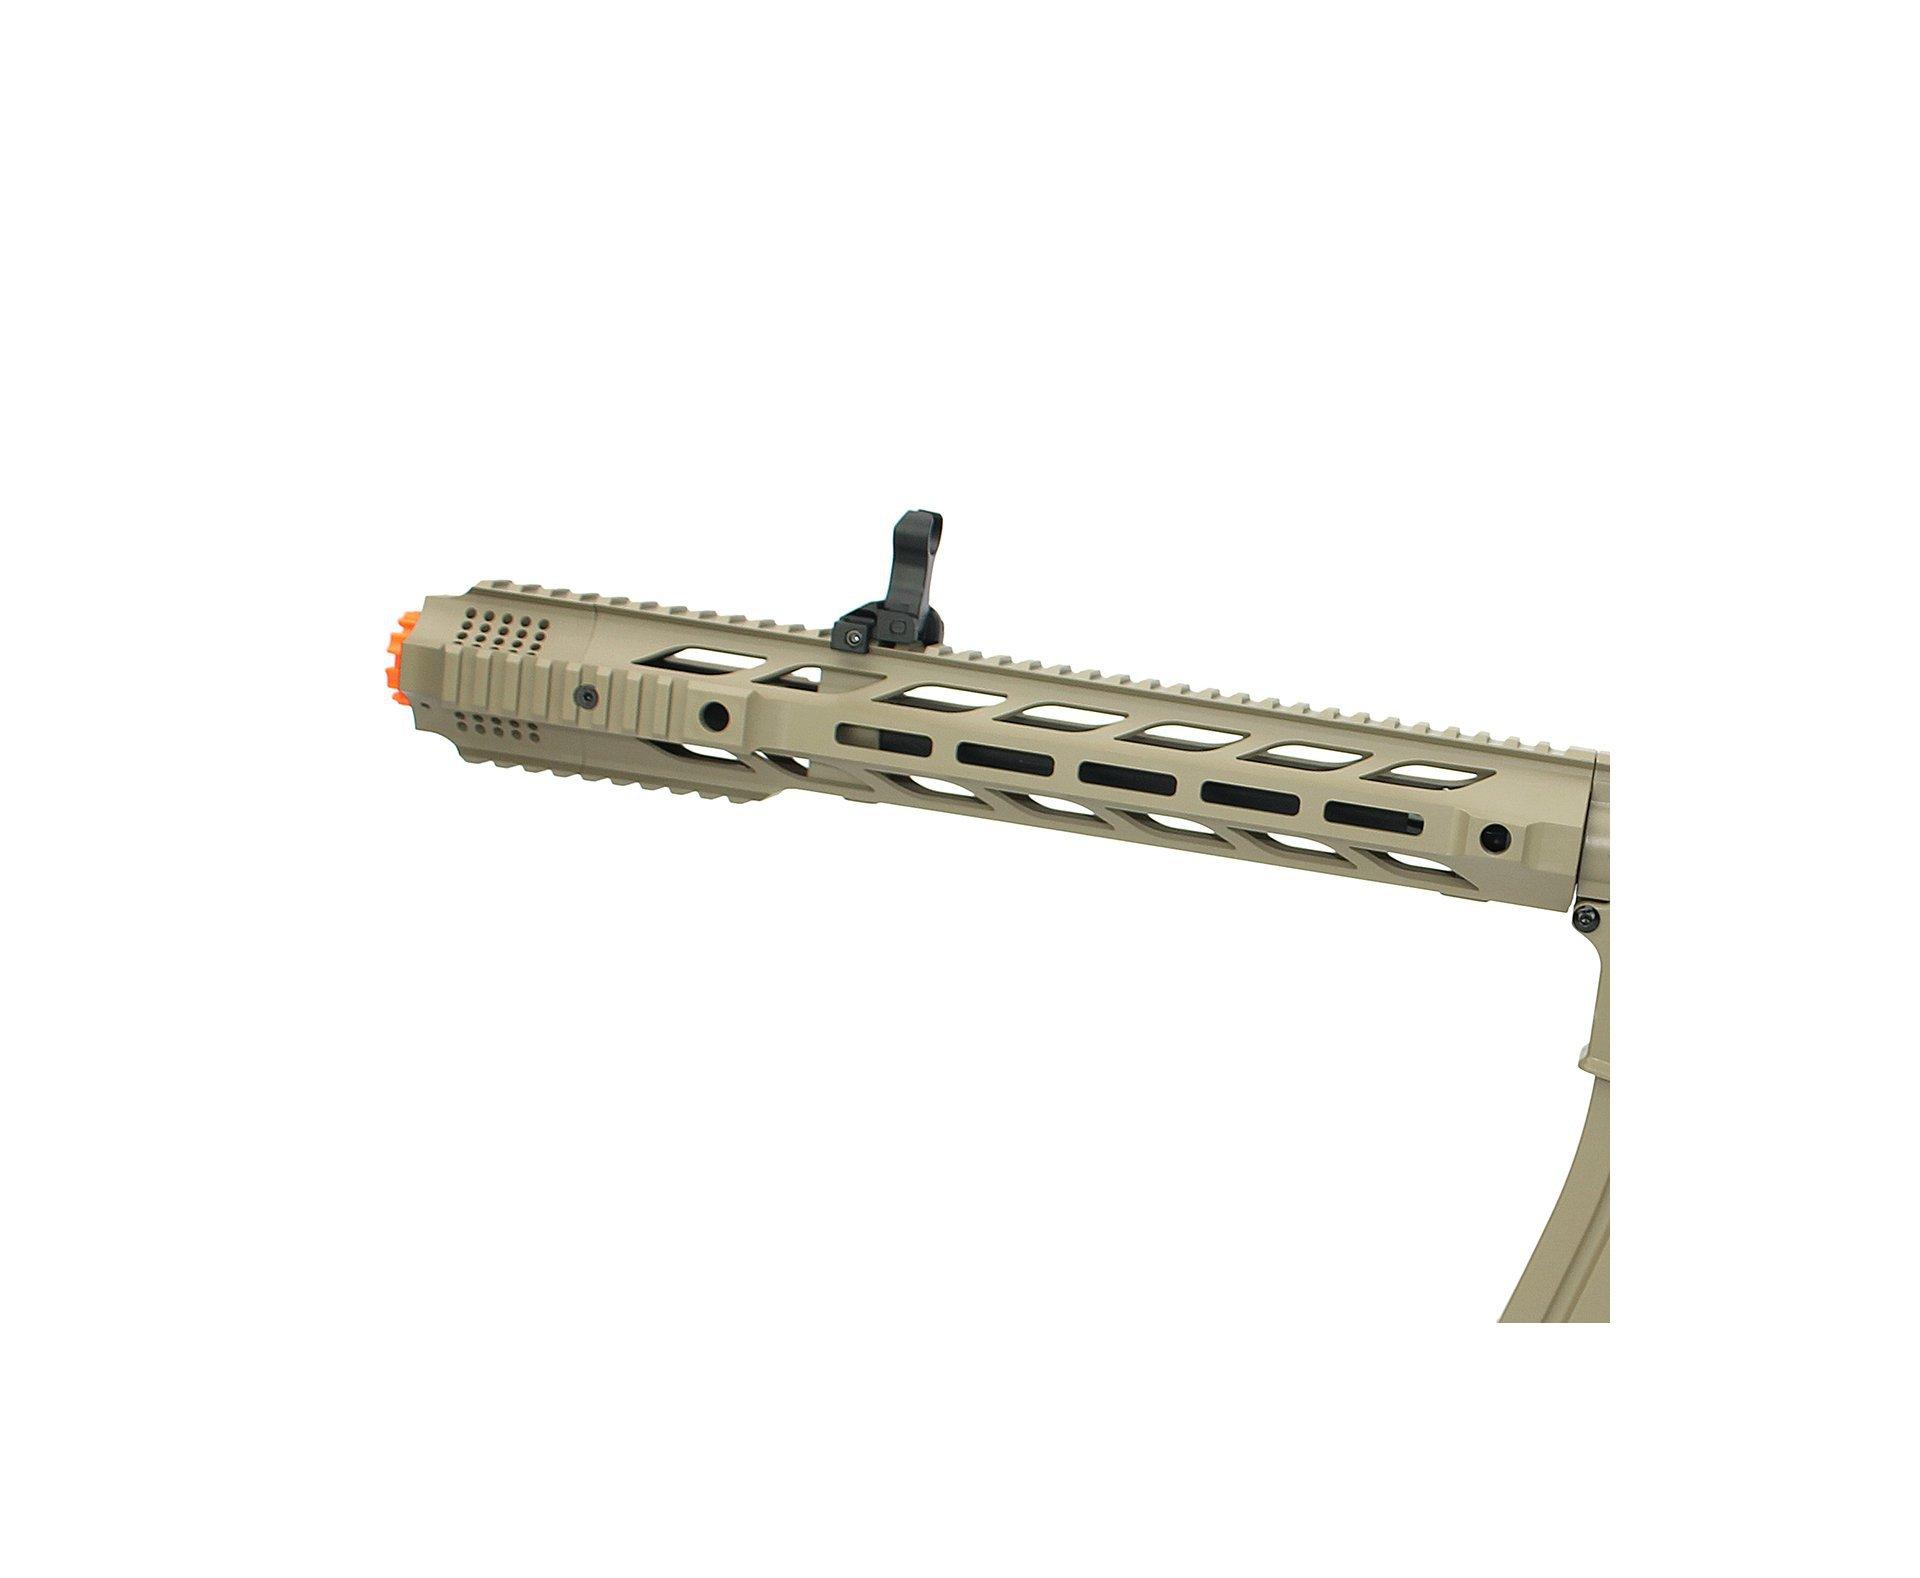 Rifle De Airsoft M4a1 Keymod Cm518 Tan - Cal 6mm- Bivolt- Cm518 - Cyma